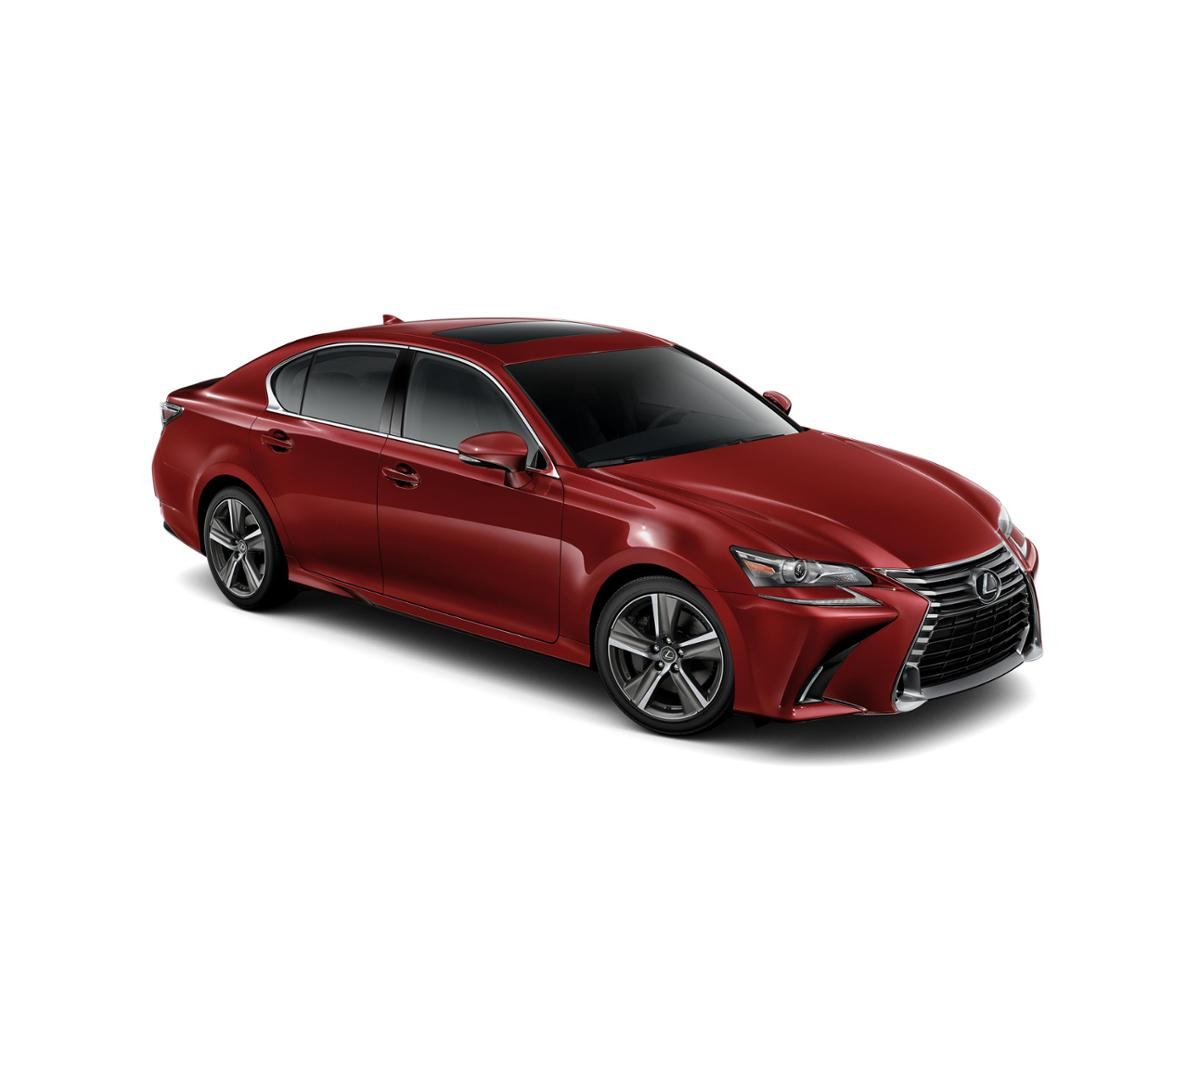 Lexus Gs For Sale: New 2018 Lexus GS 350 For Sale In Scottsdale Tempe Phoenix